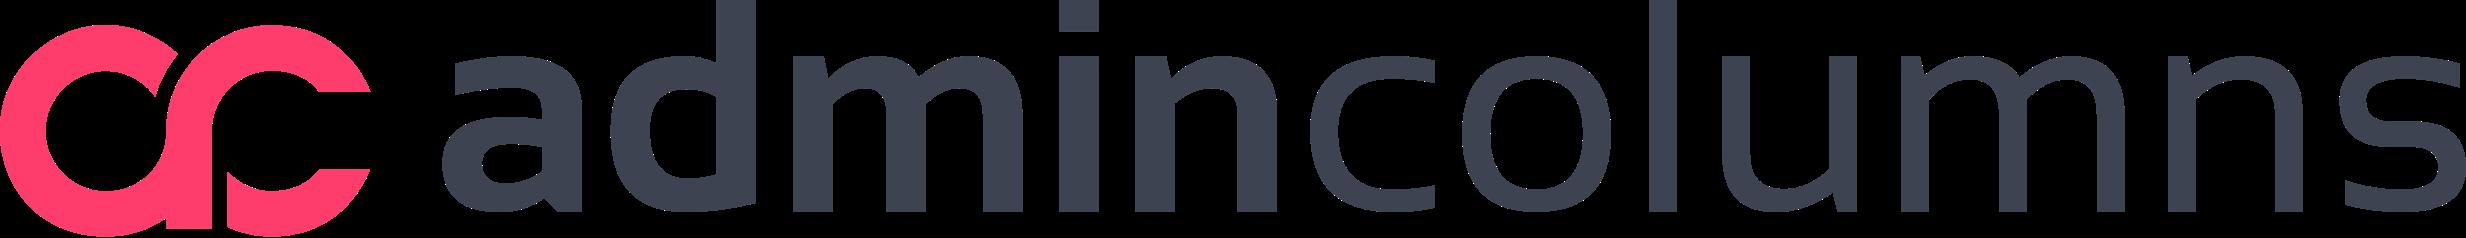 Admin Columns pink logo